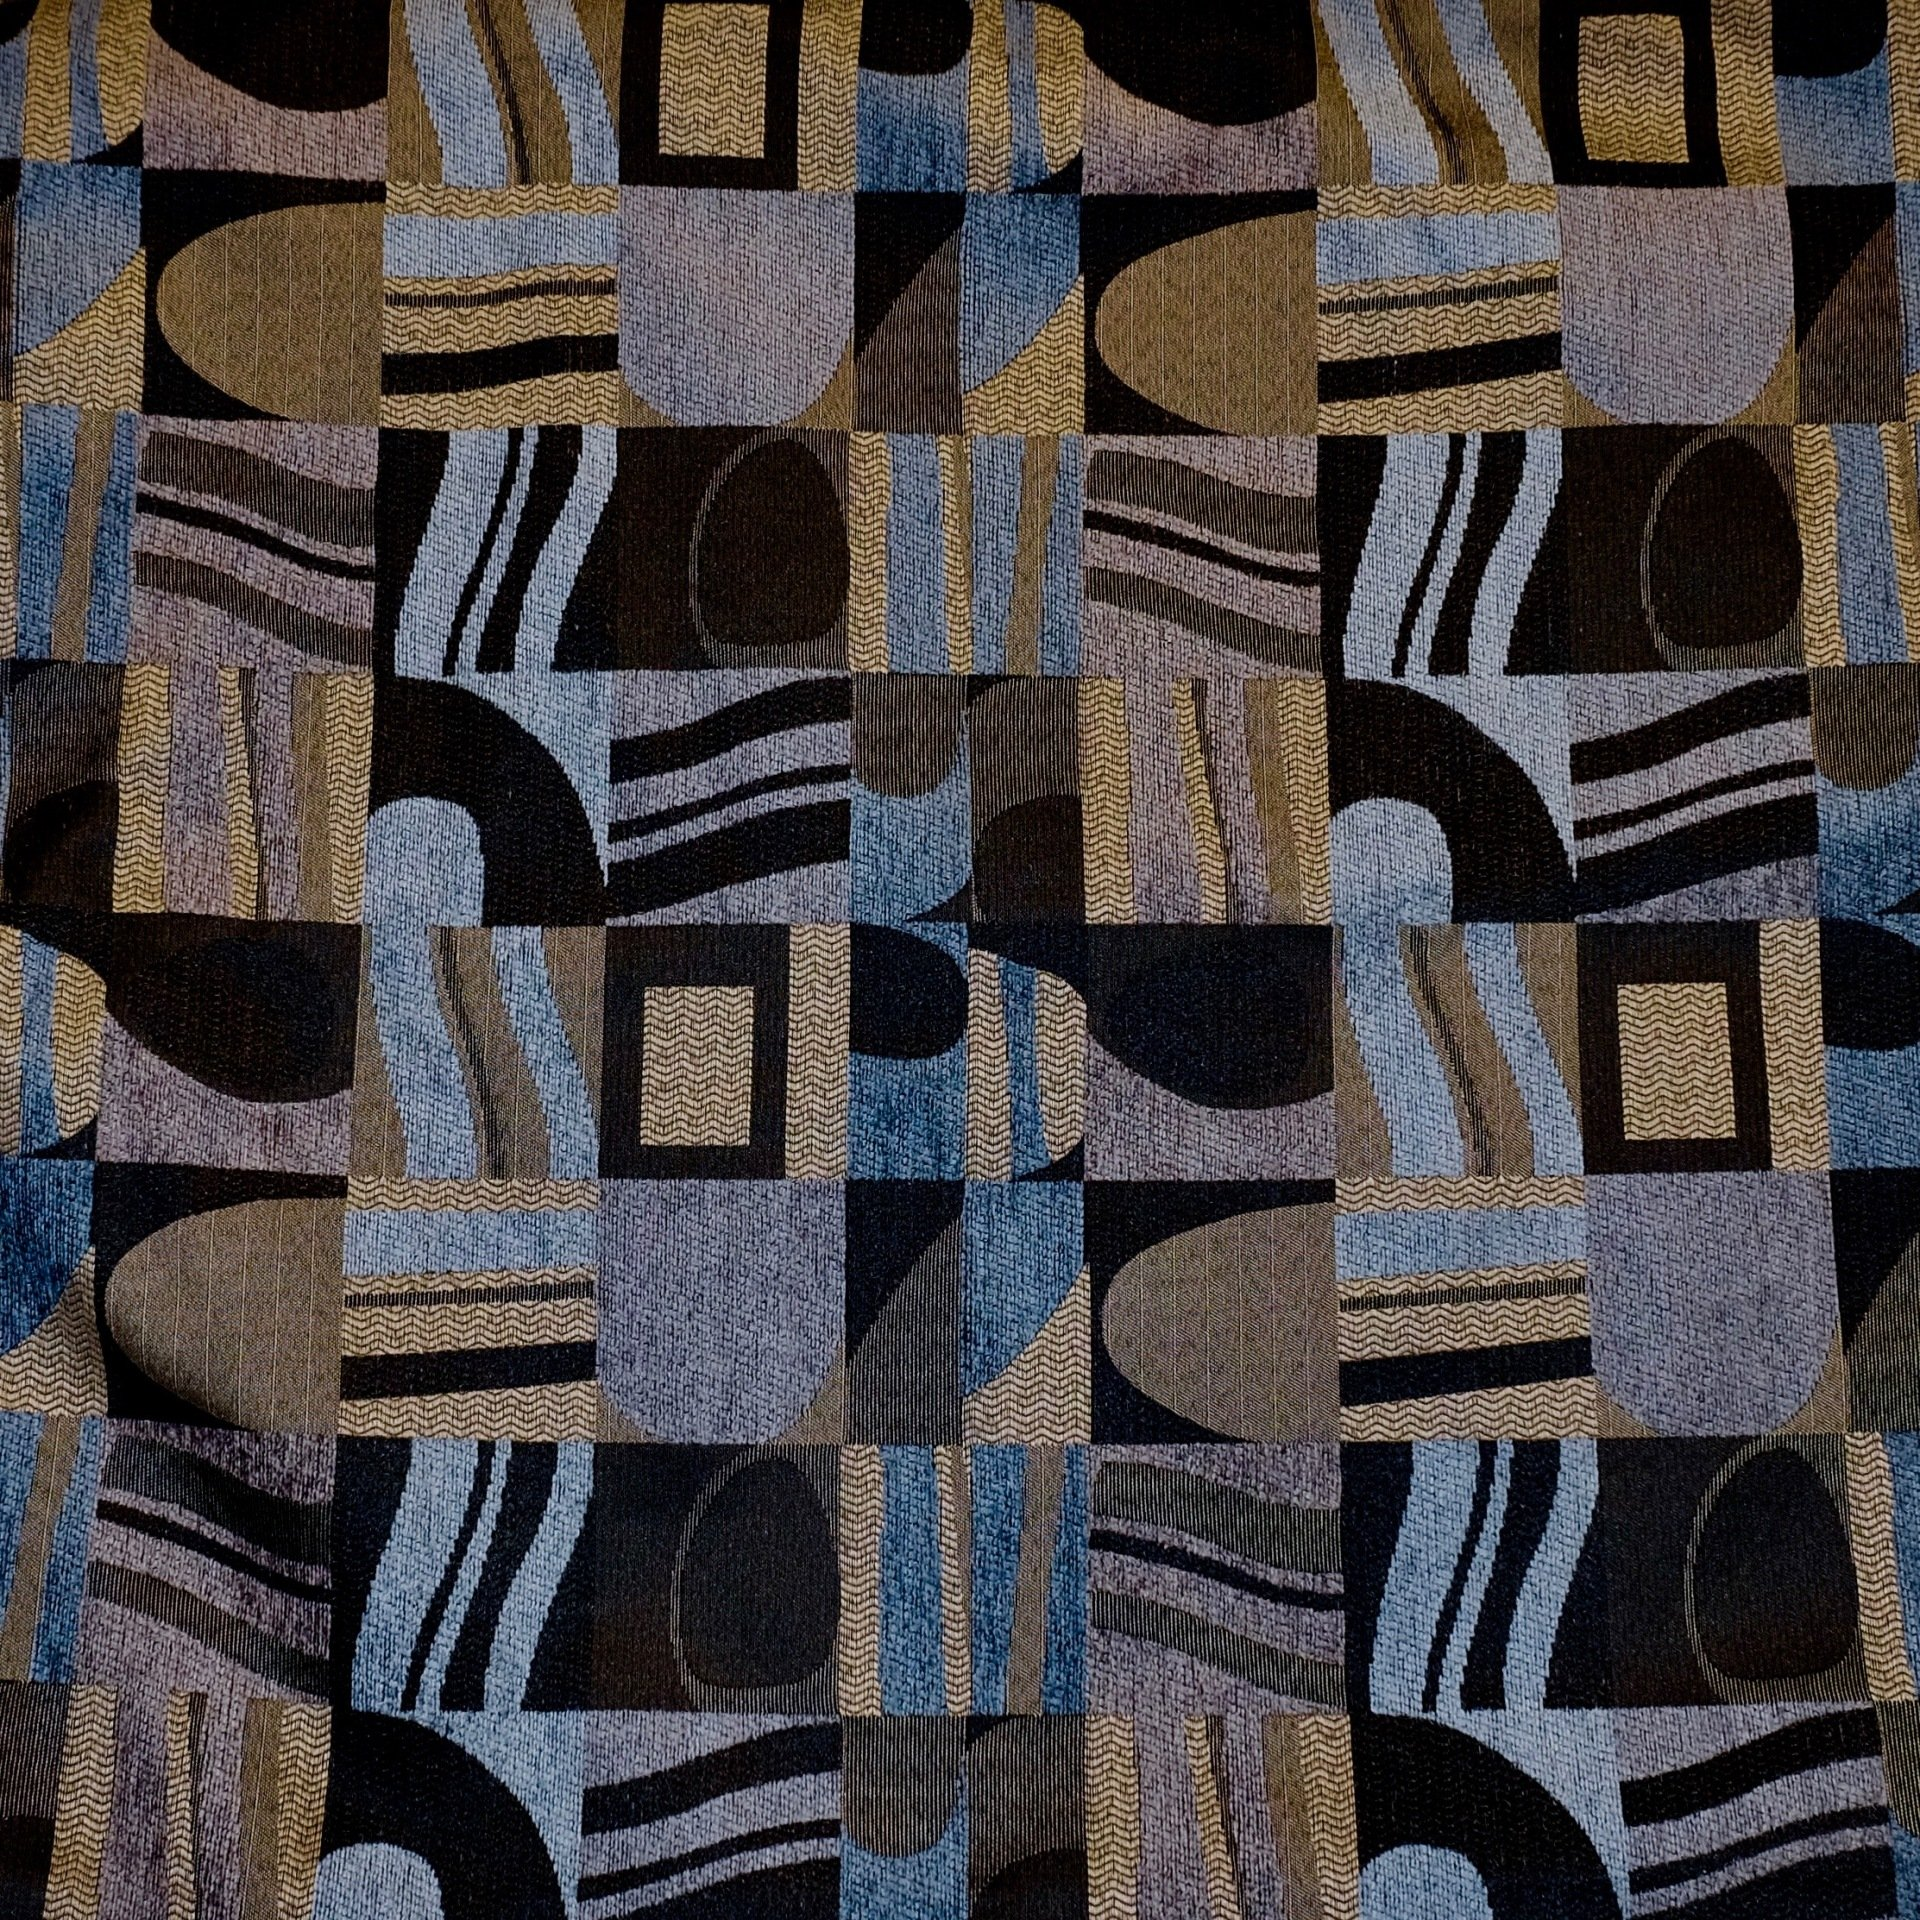 chair covers hamilton ontario folding storage hooks canadian made futons futon high quality